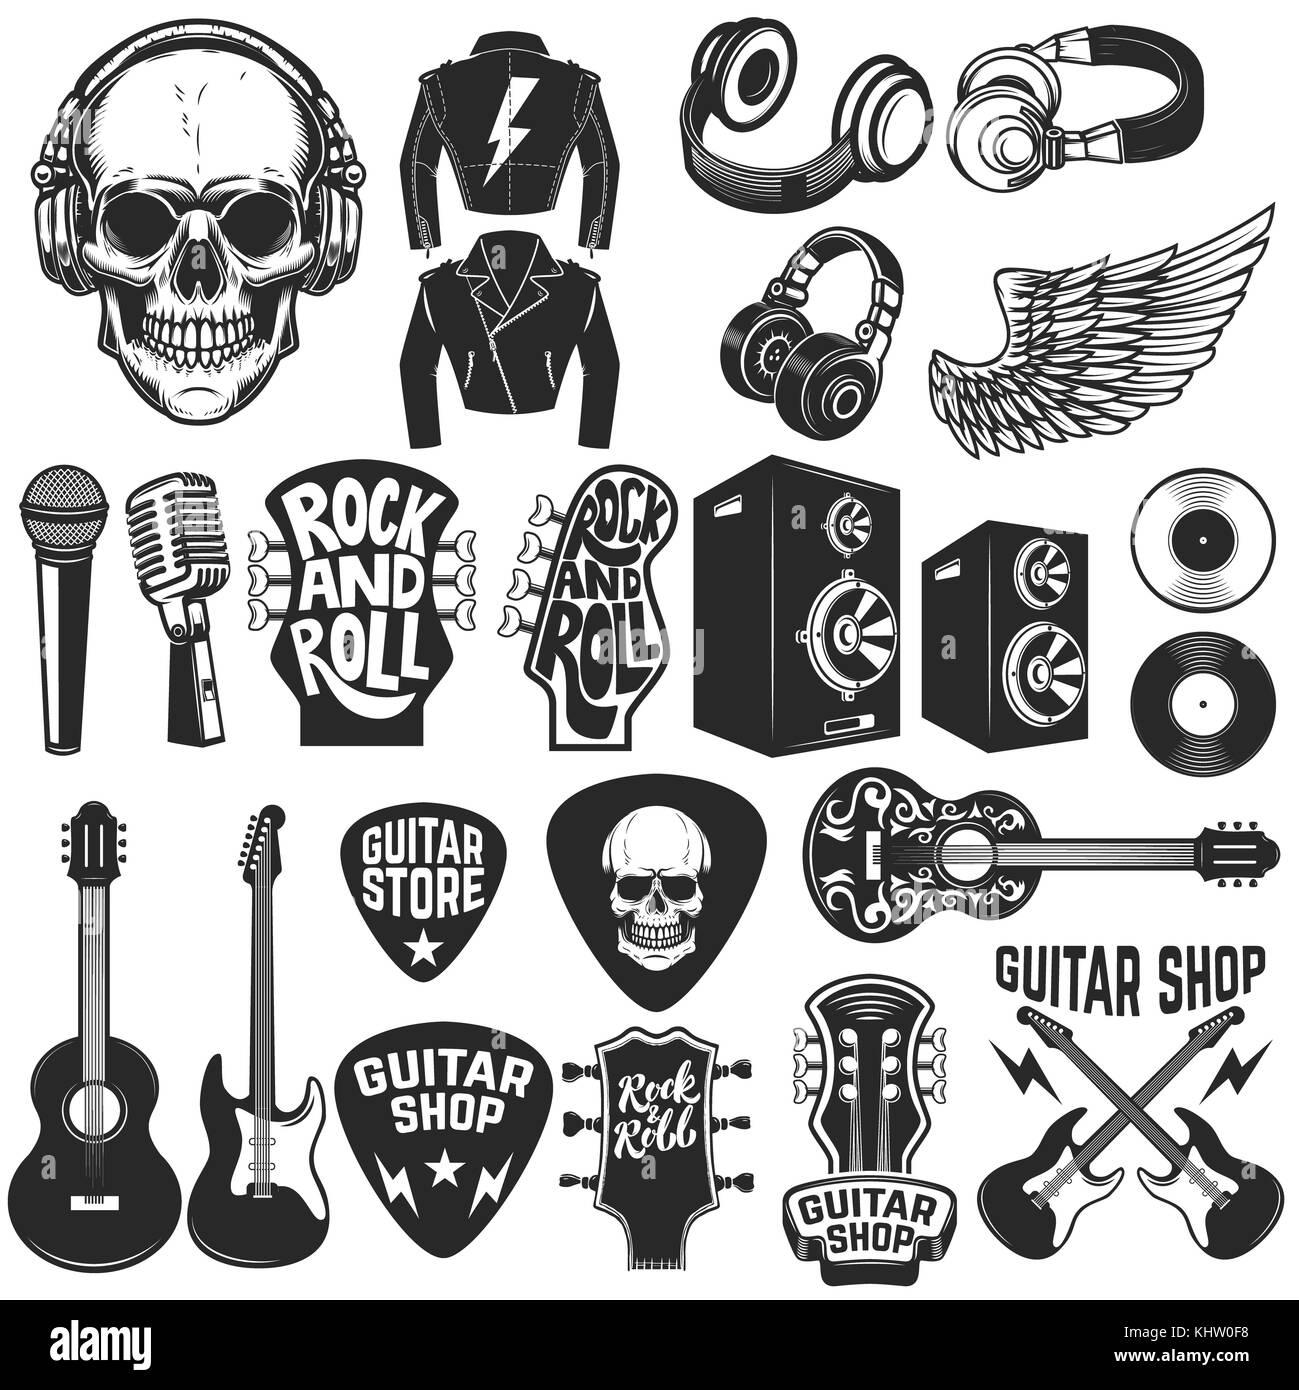 Punk Rocker Black And White Stock Photos Amp Images Alamy